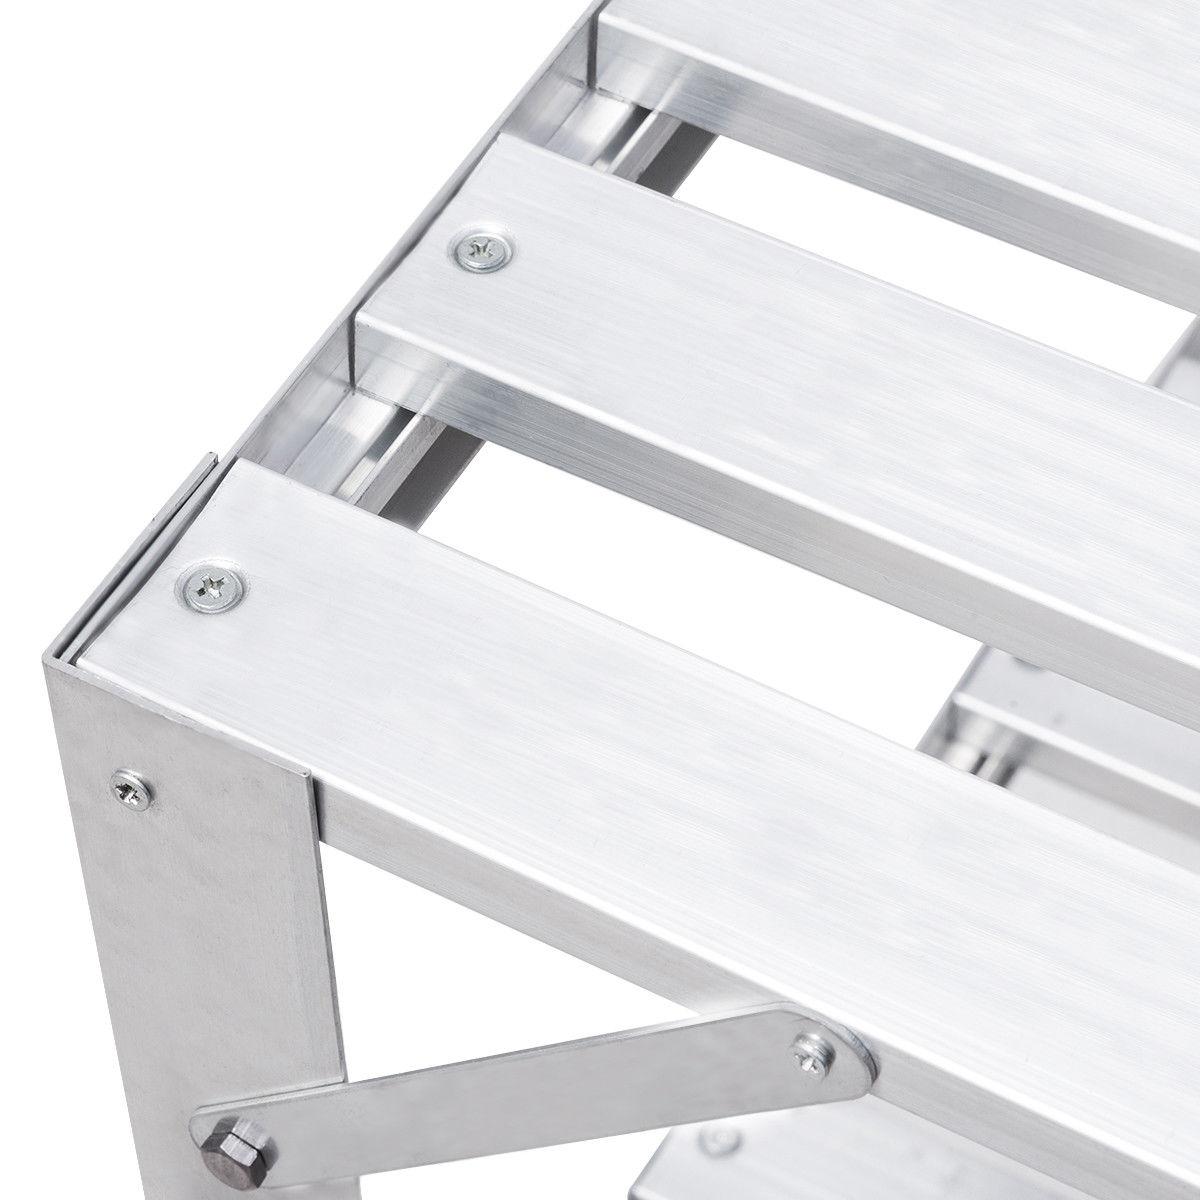 Aluminum Workbench Greenhouse Prepare Work Potting Table